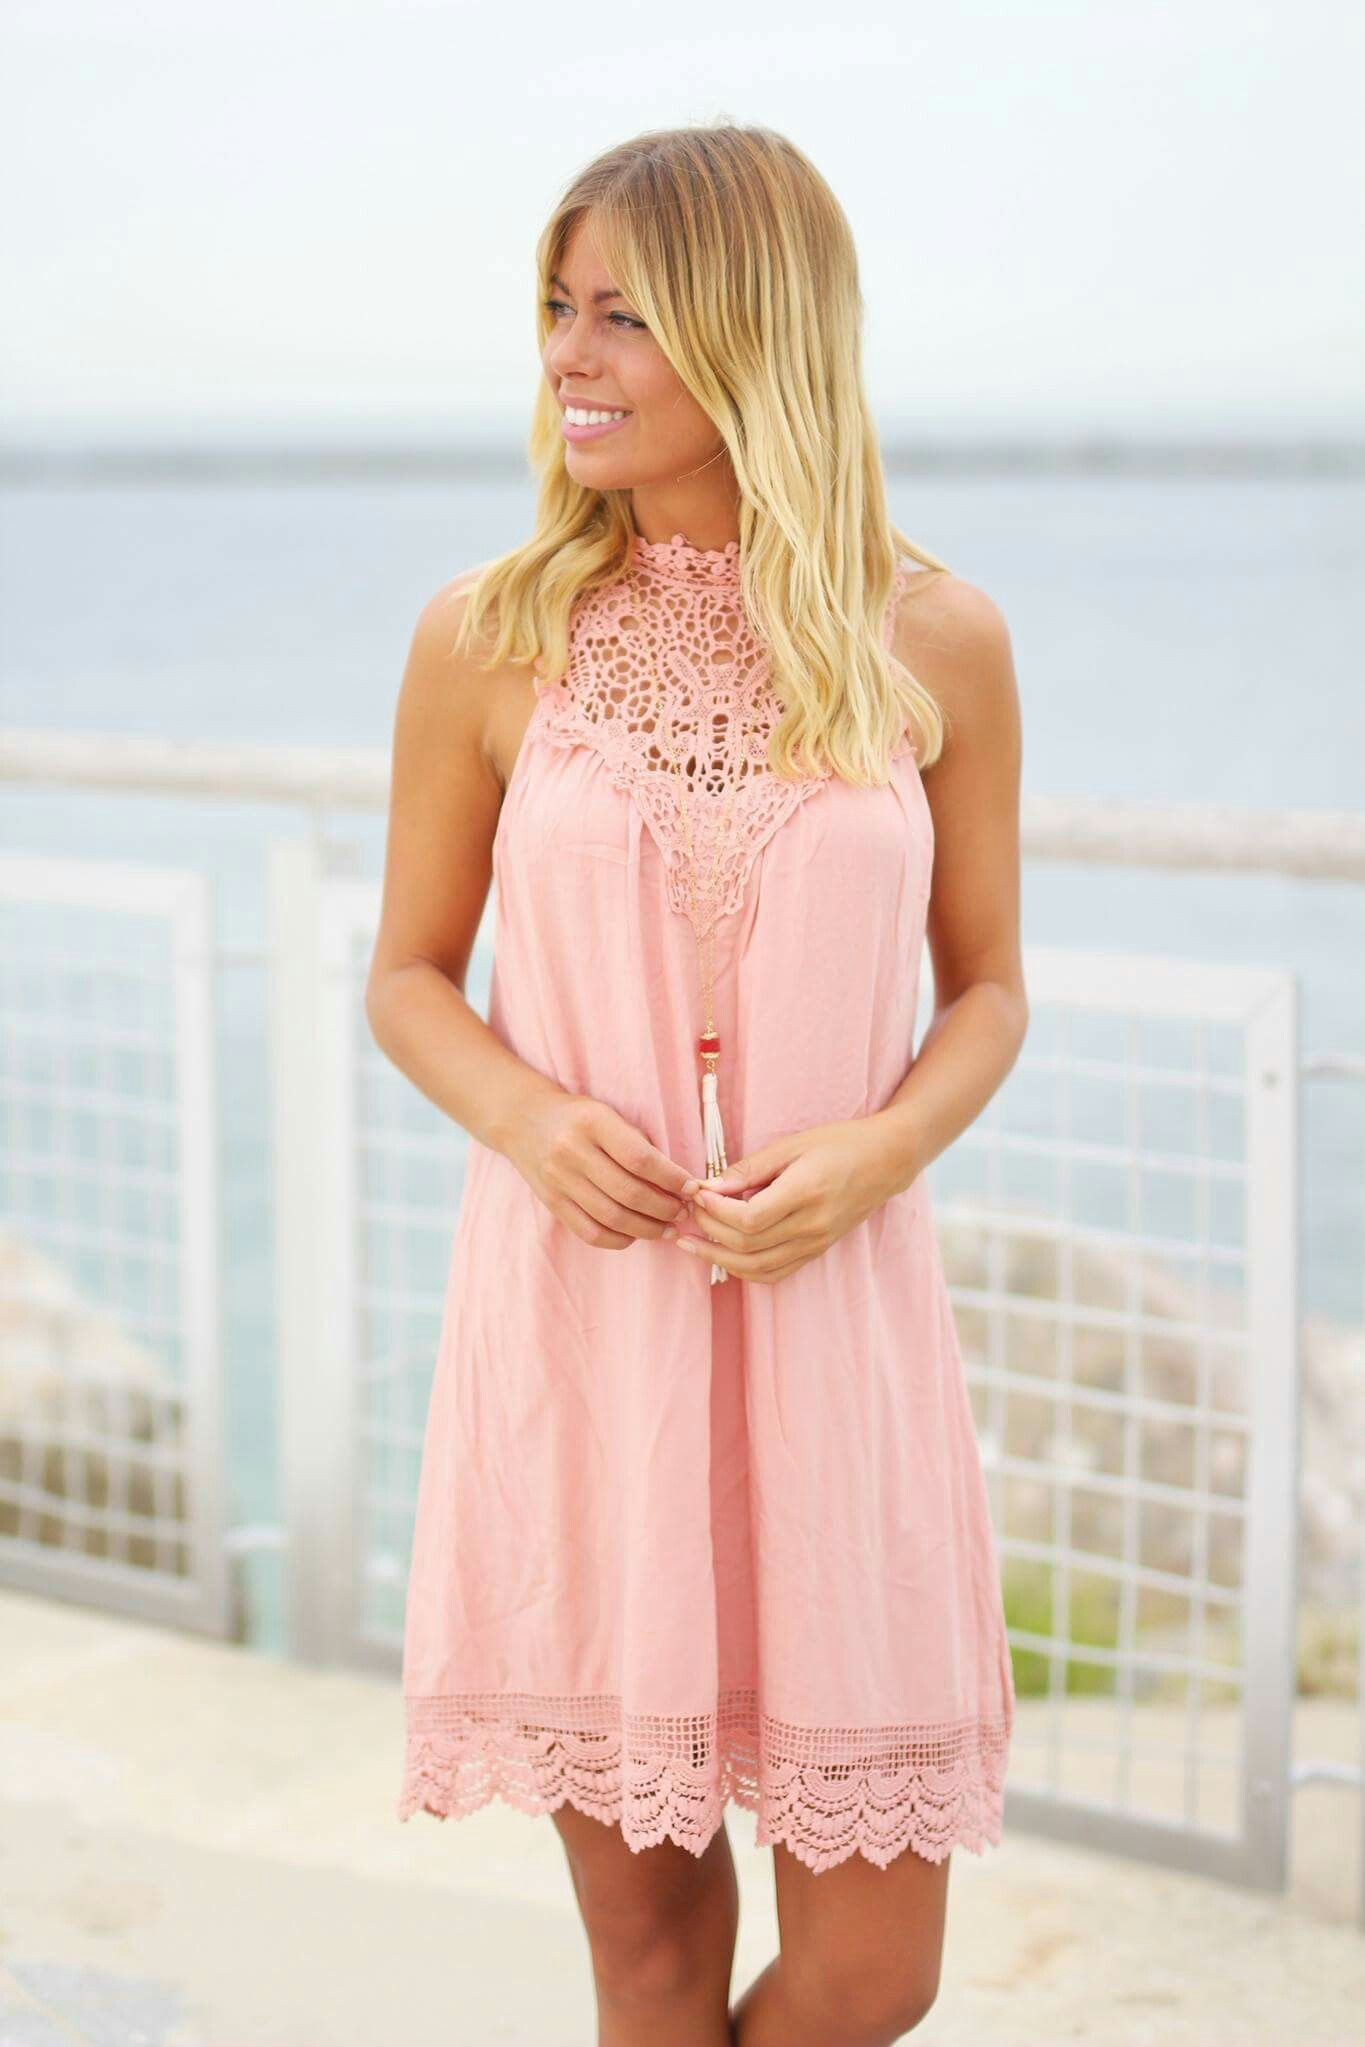 Pin de Marissa King en Clothing | Pinterest